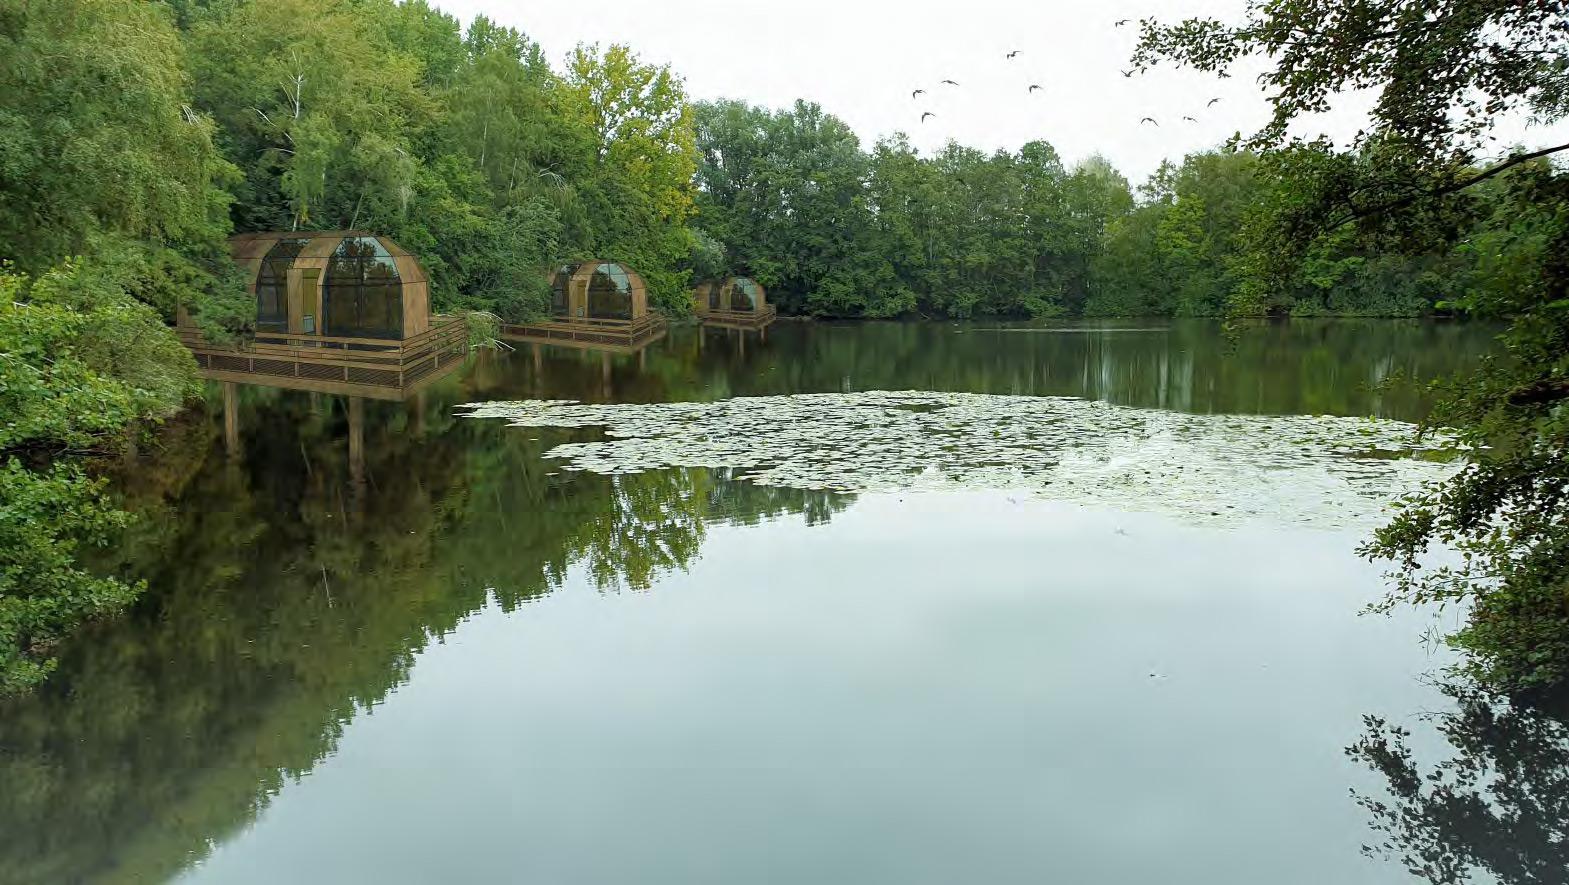 Tortiga-cabins-project-Kappermeer-Turnhout